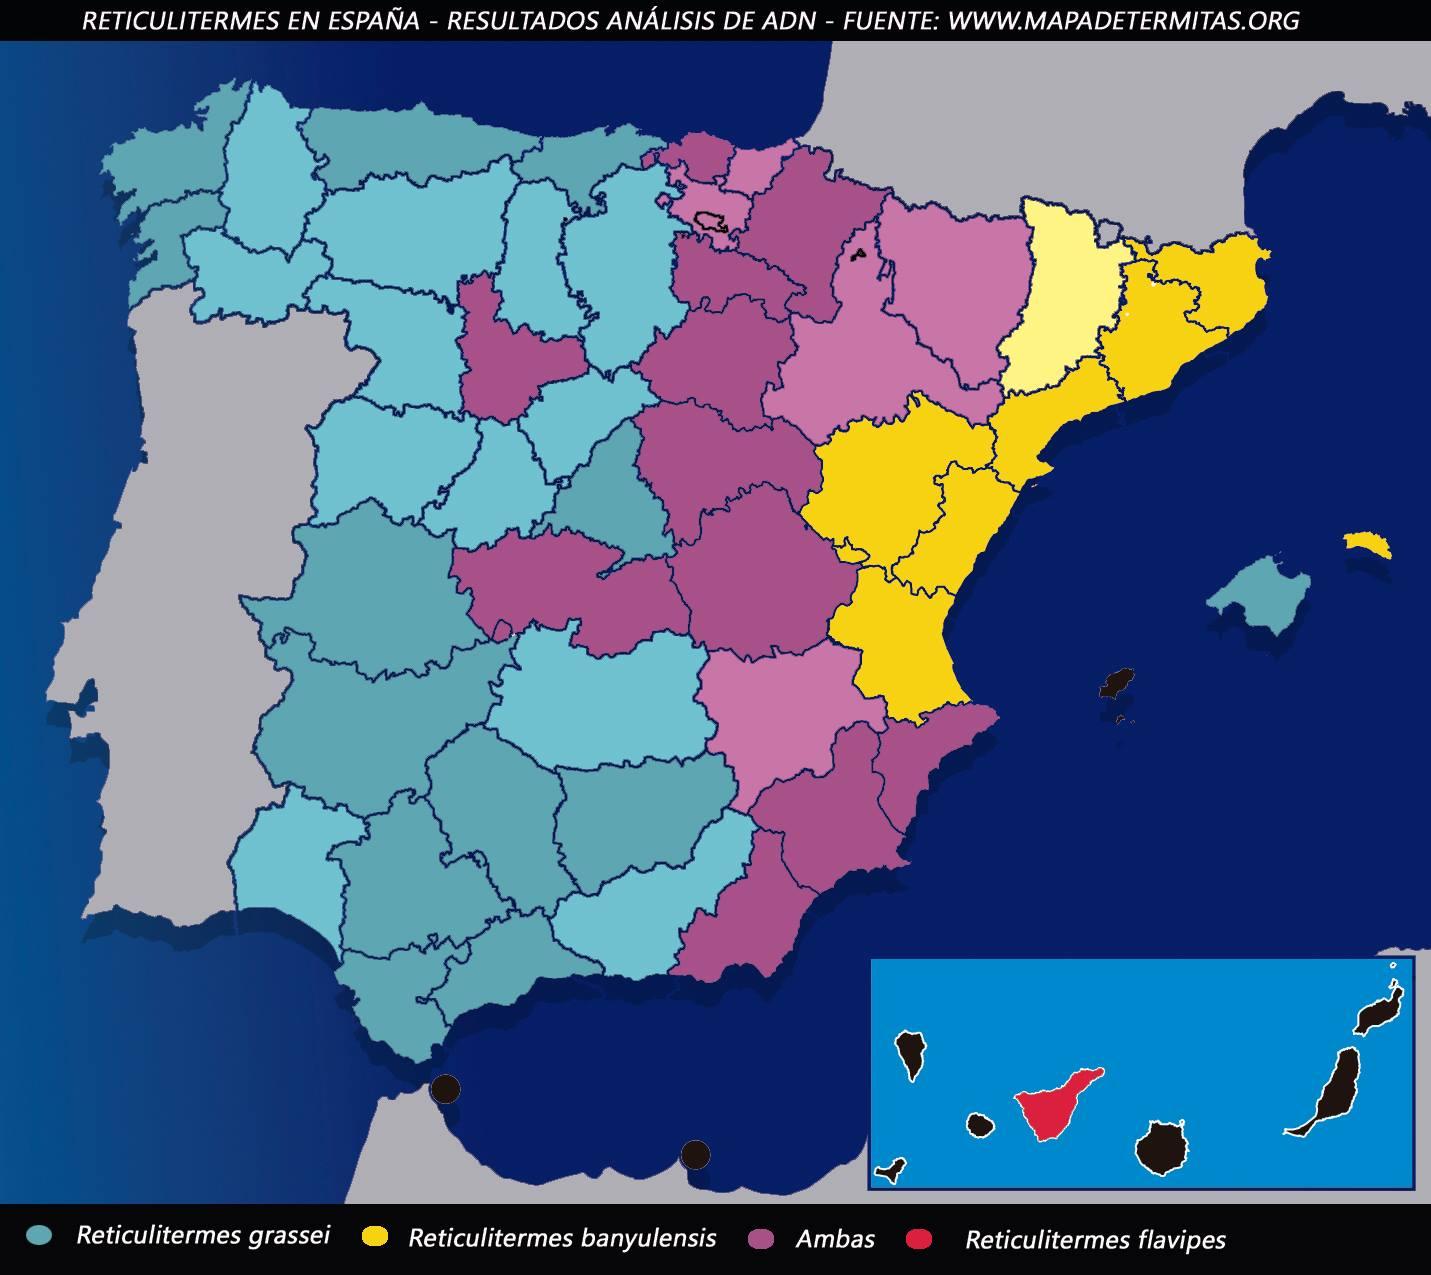 Reticulitermes en España